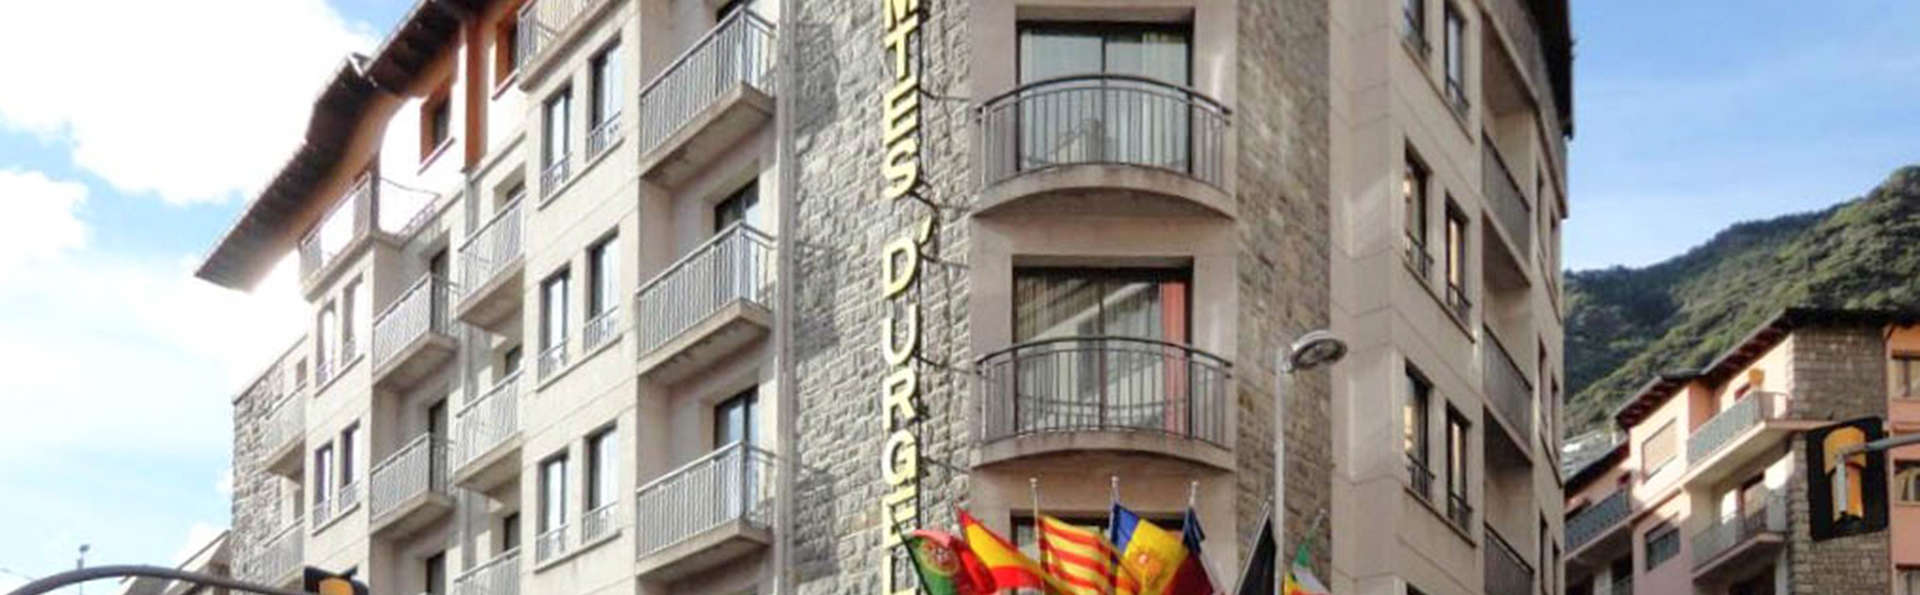 Hotel Comtes d'Urgell - EDIT_FRONT_01.jpg